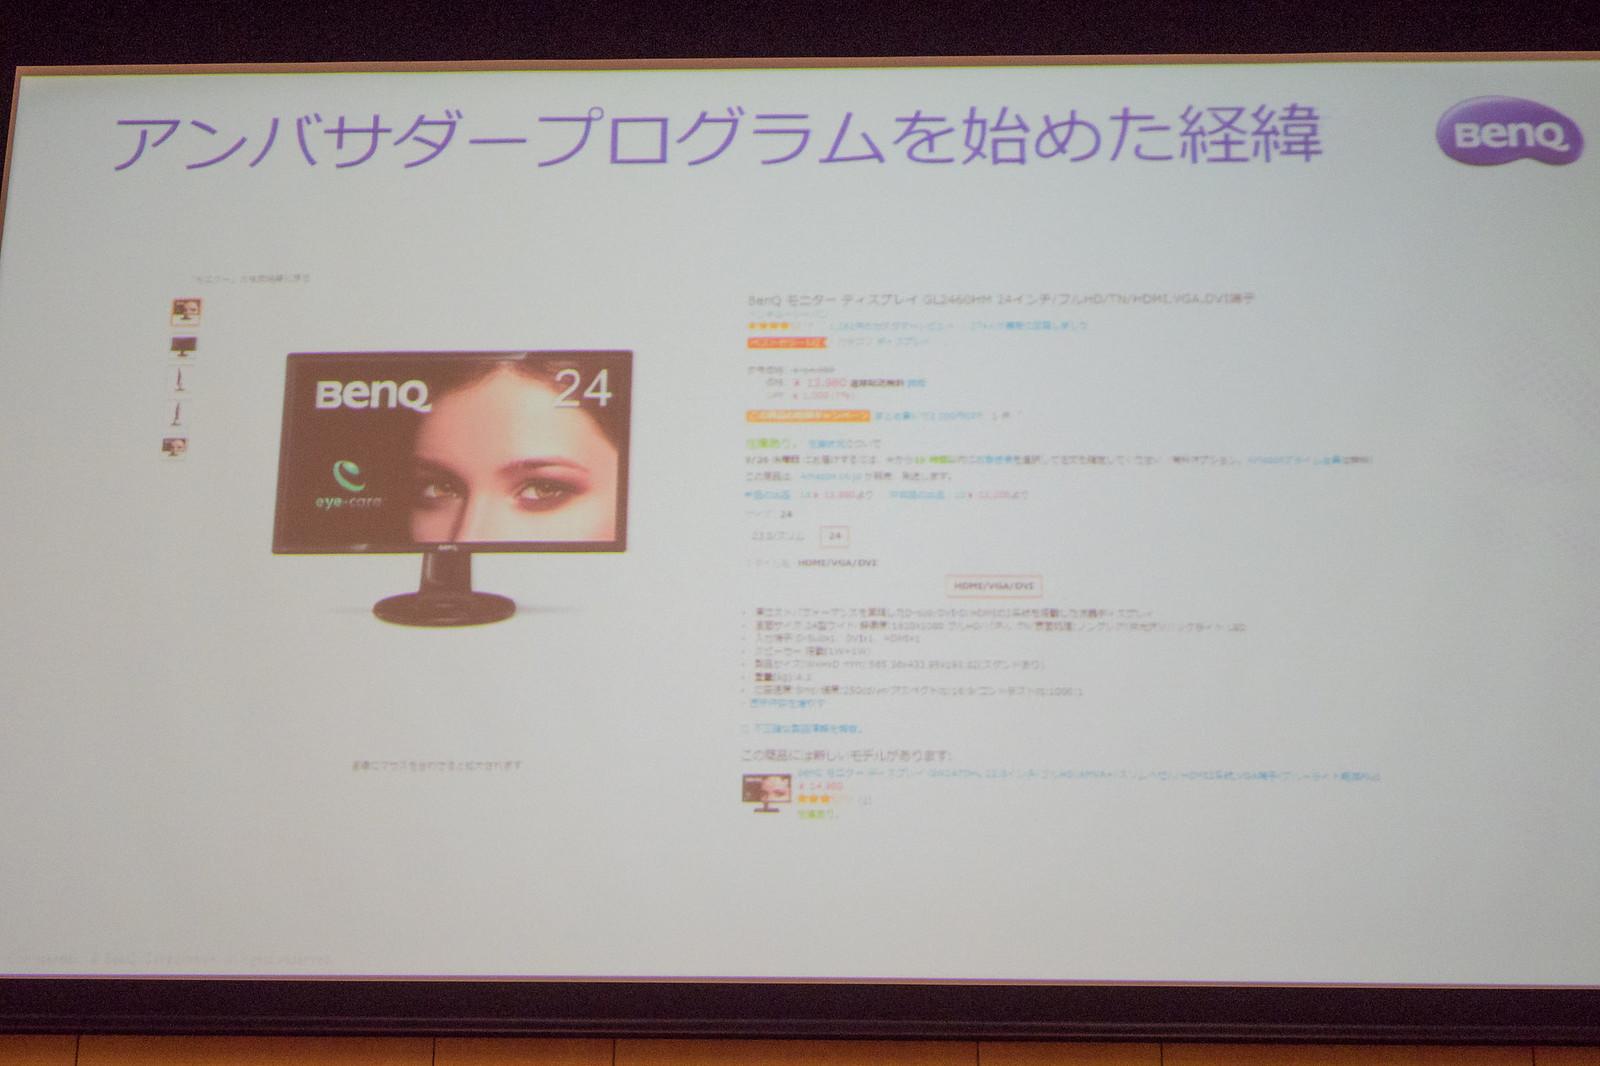 BenQ_events-29